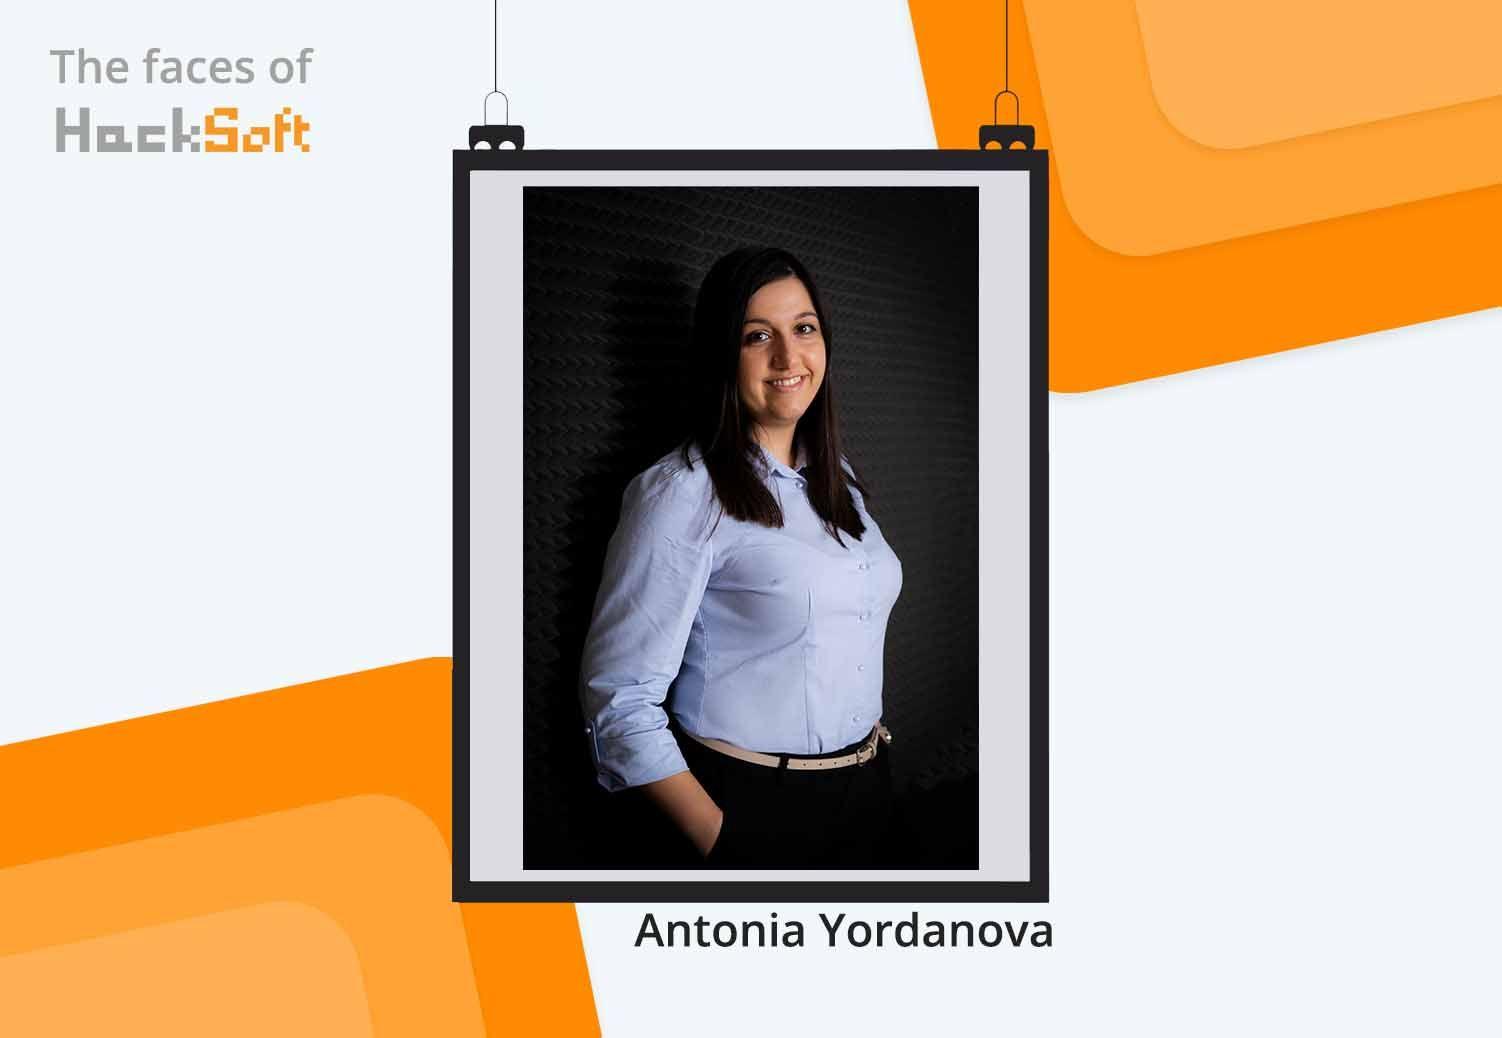 The Faces of HackSoft - Antonia Yordanova